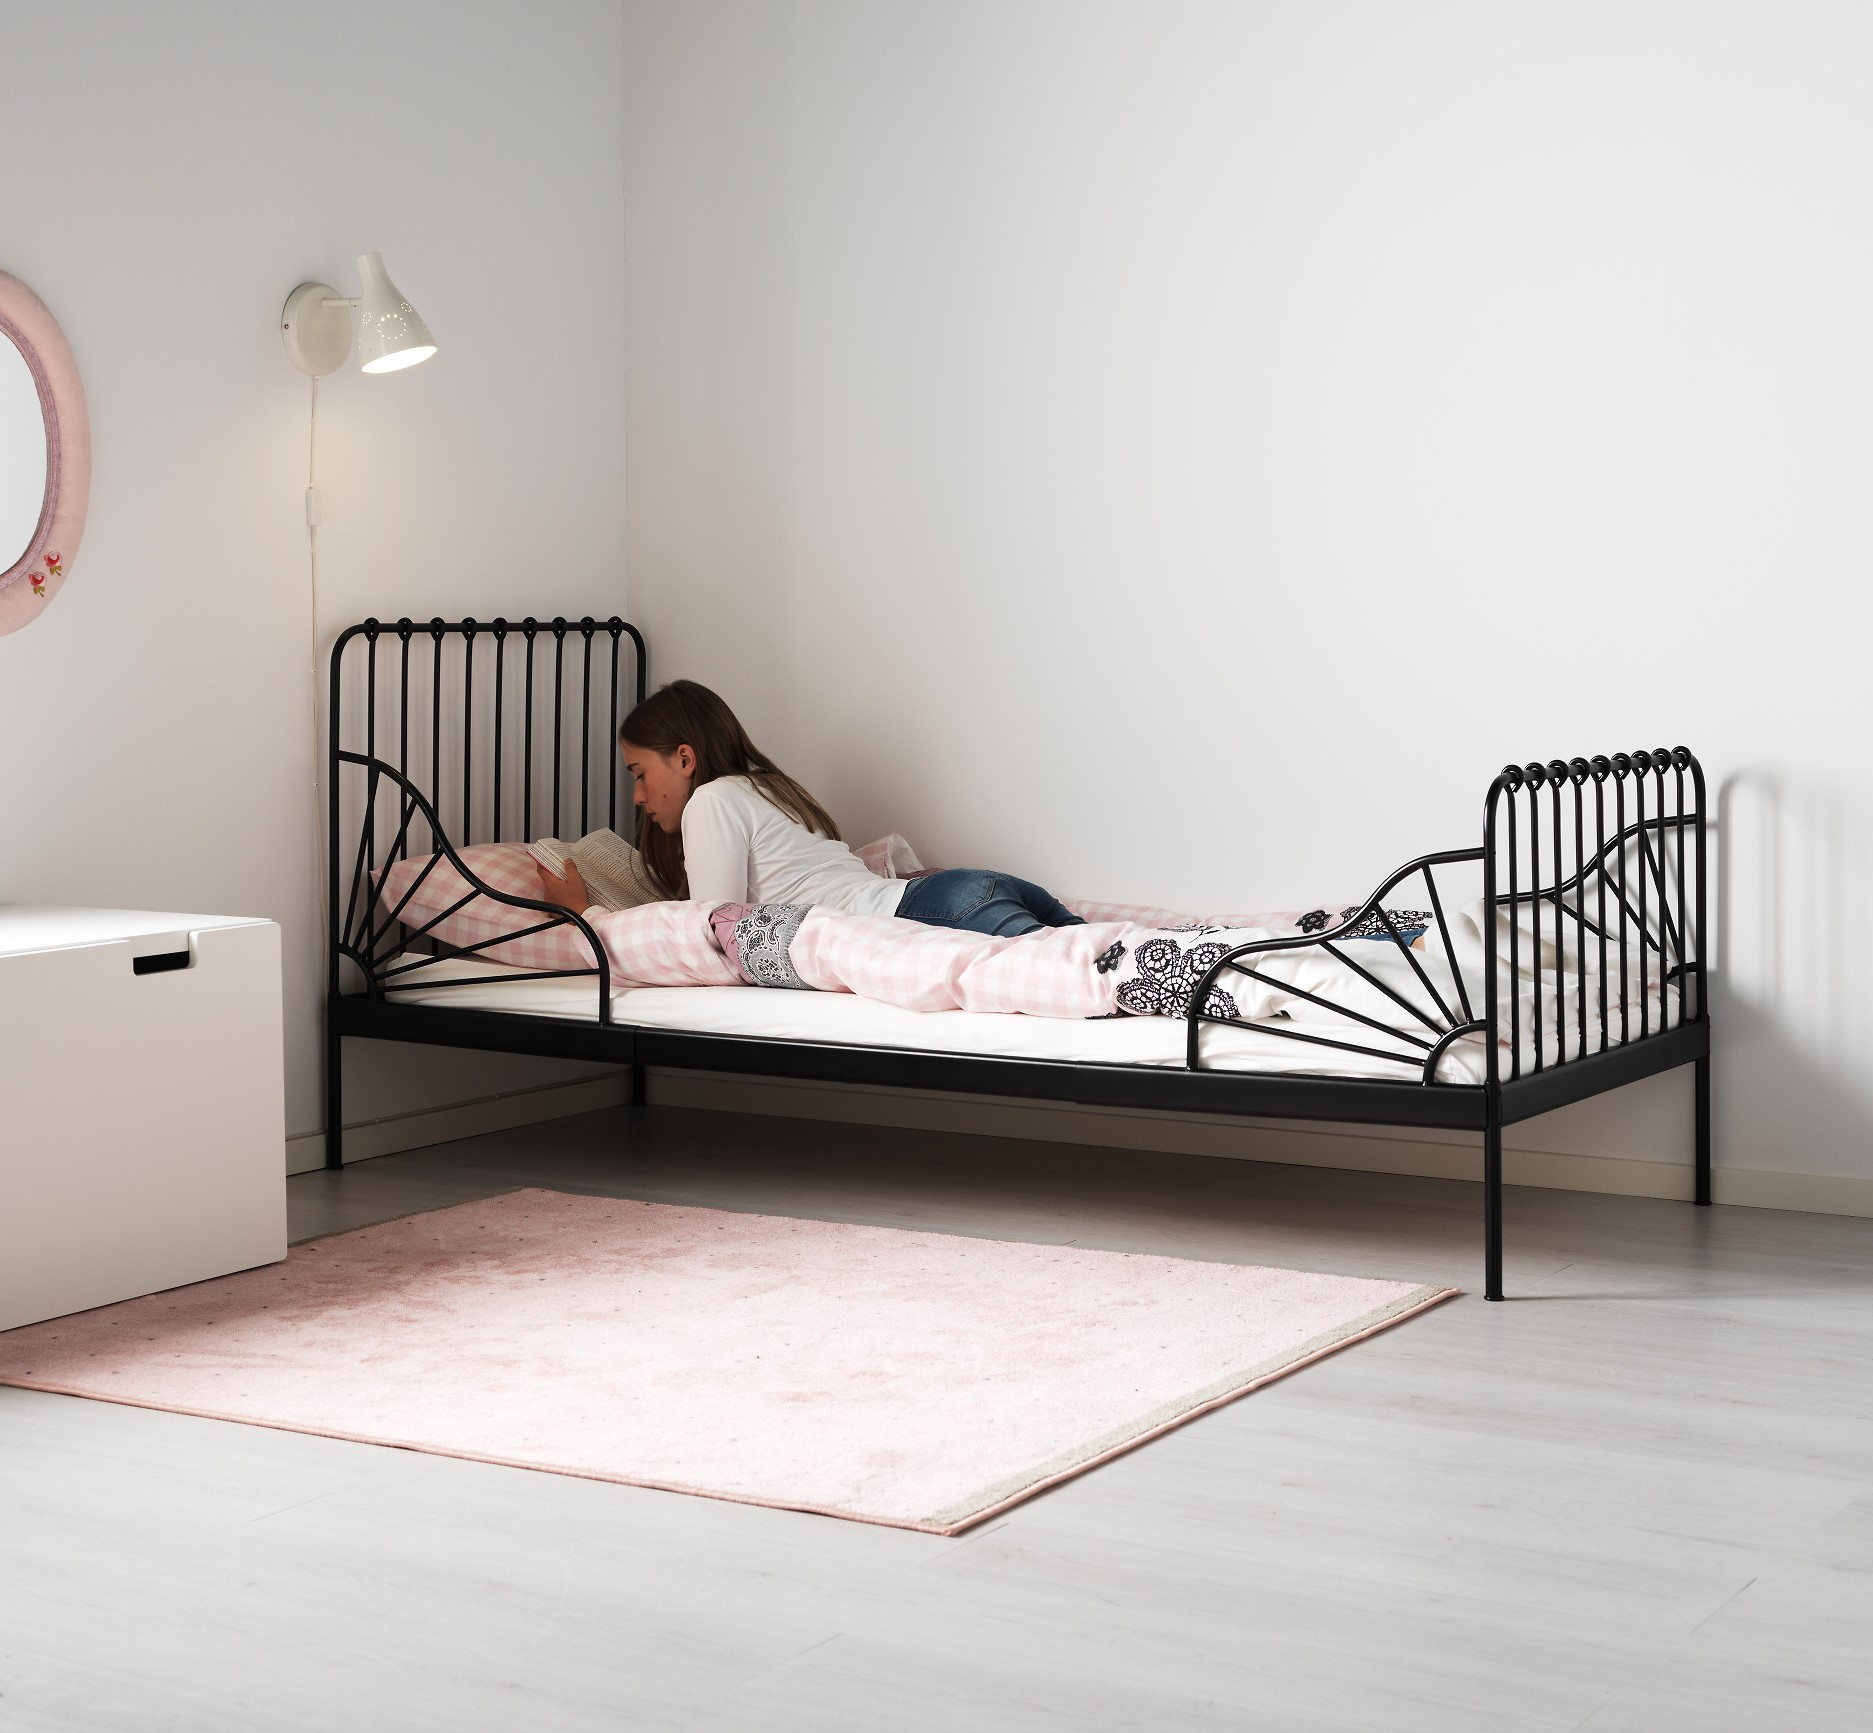 Ikea Katil Tunggal 26 Gambar Katil Kayu Dengan Tilam Produk Palsu Besi Dimensi 90x200